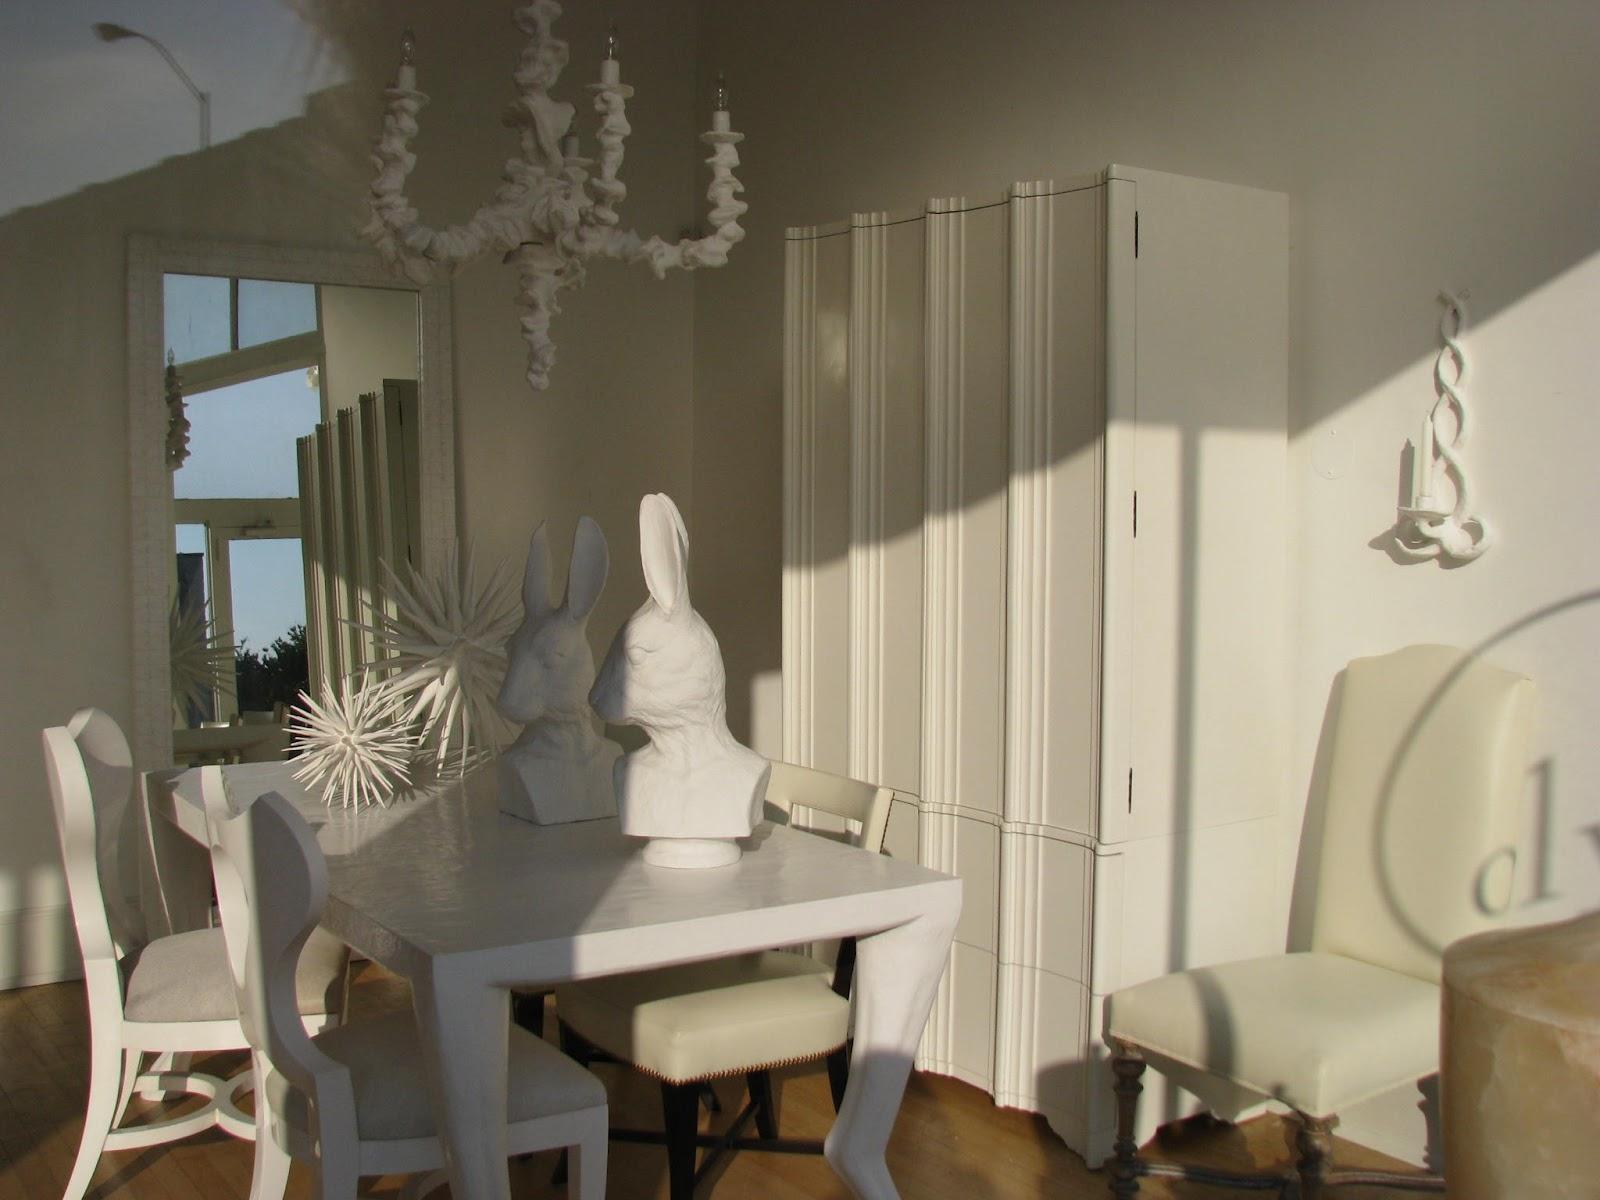 The View Through The Window: Oly Studio